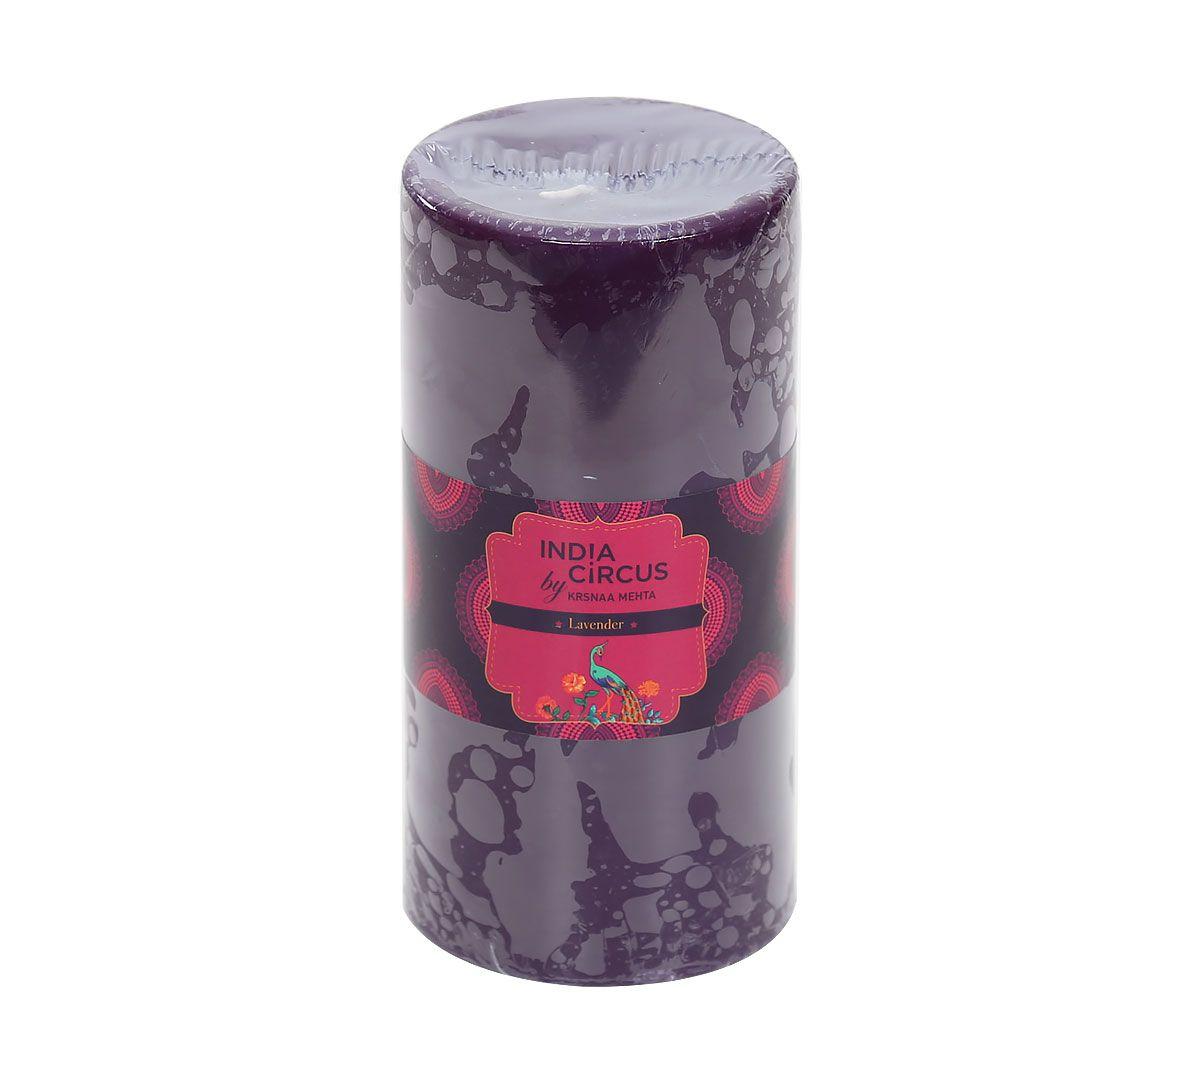 India Circus Lavender Pillar Candle